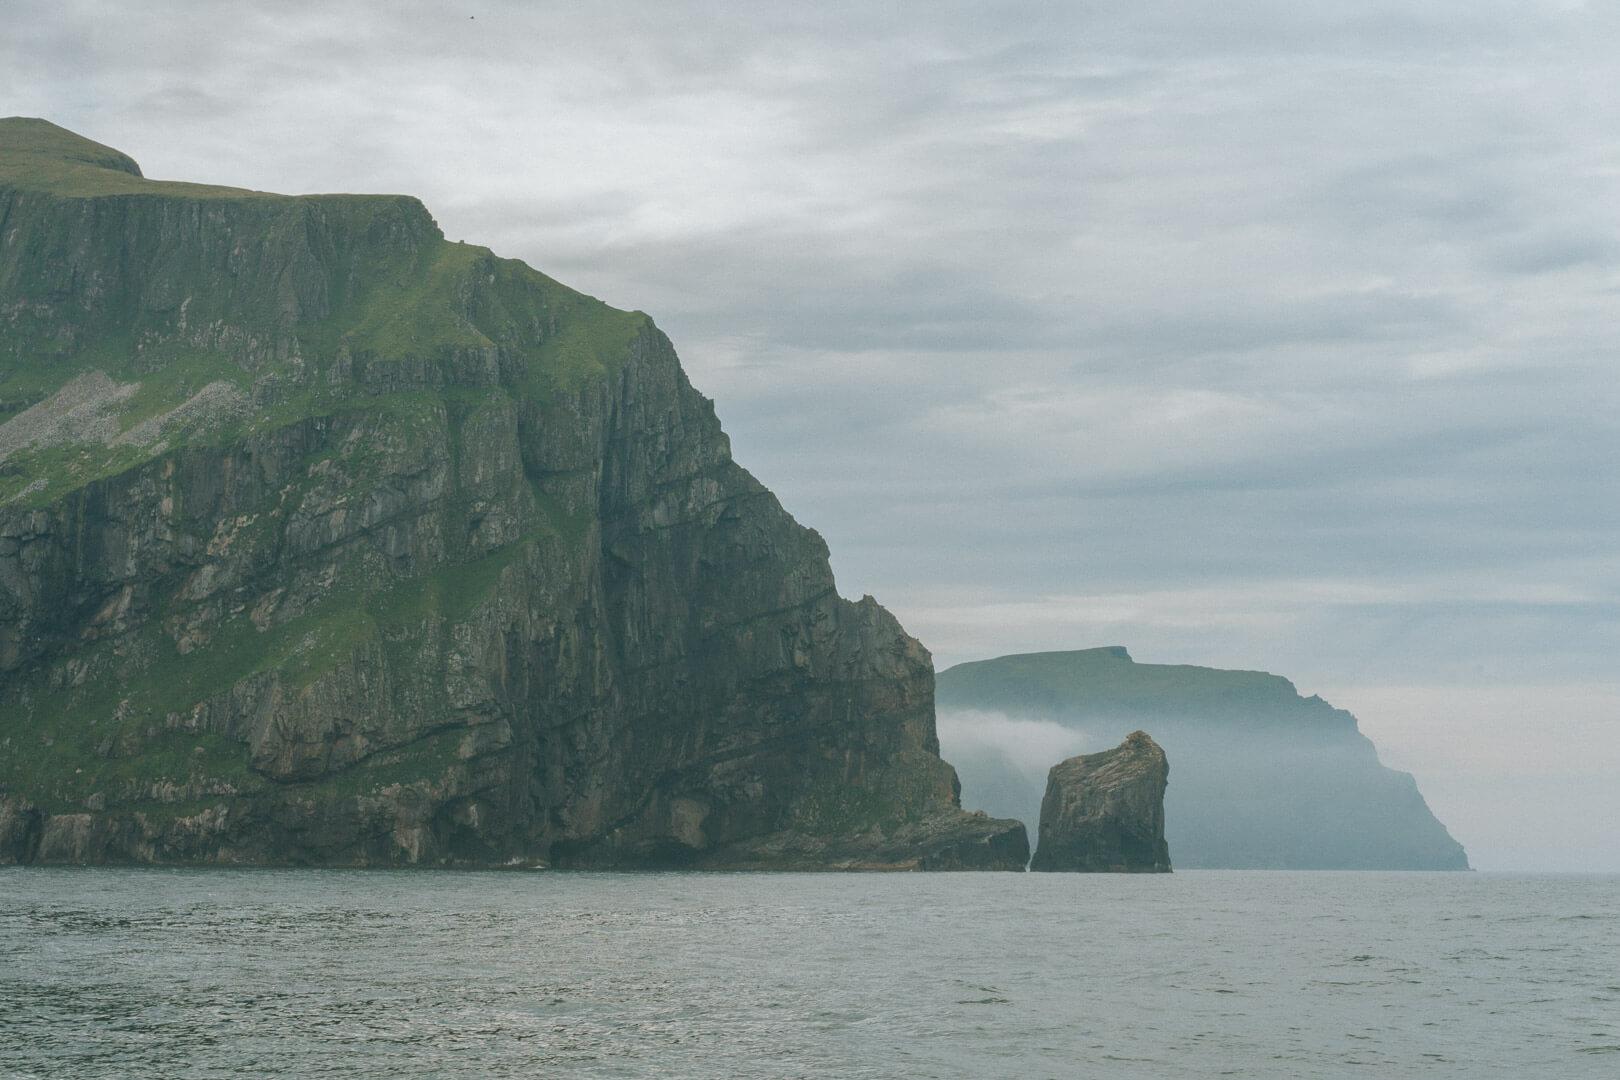 St Kilda from afar